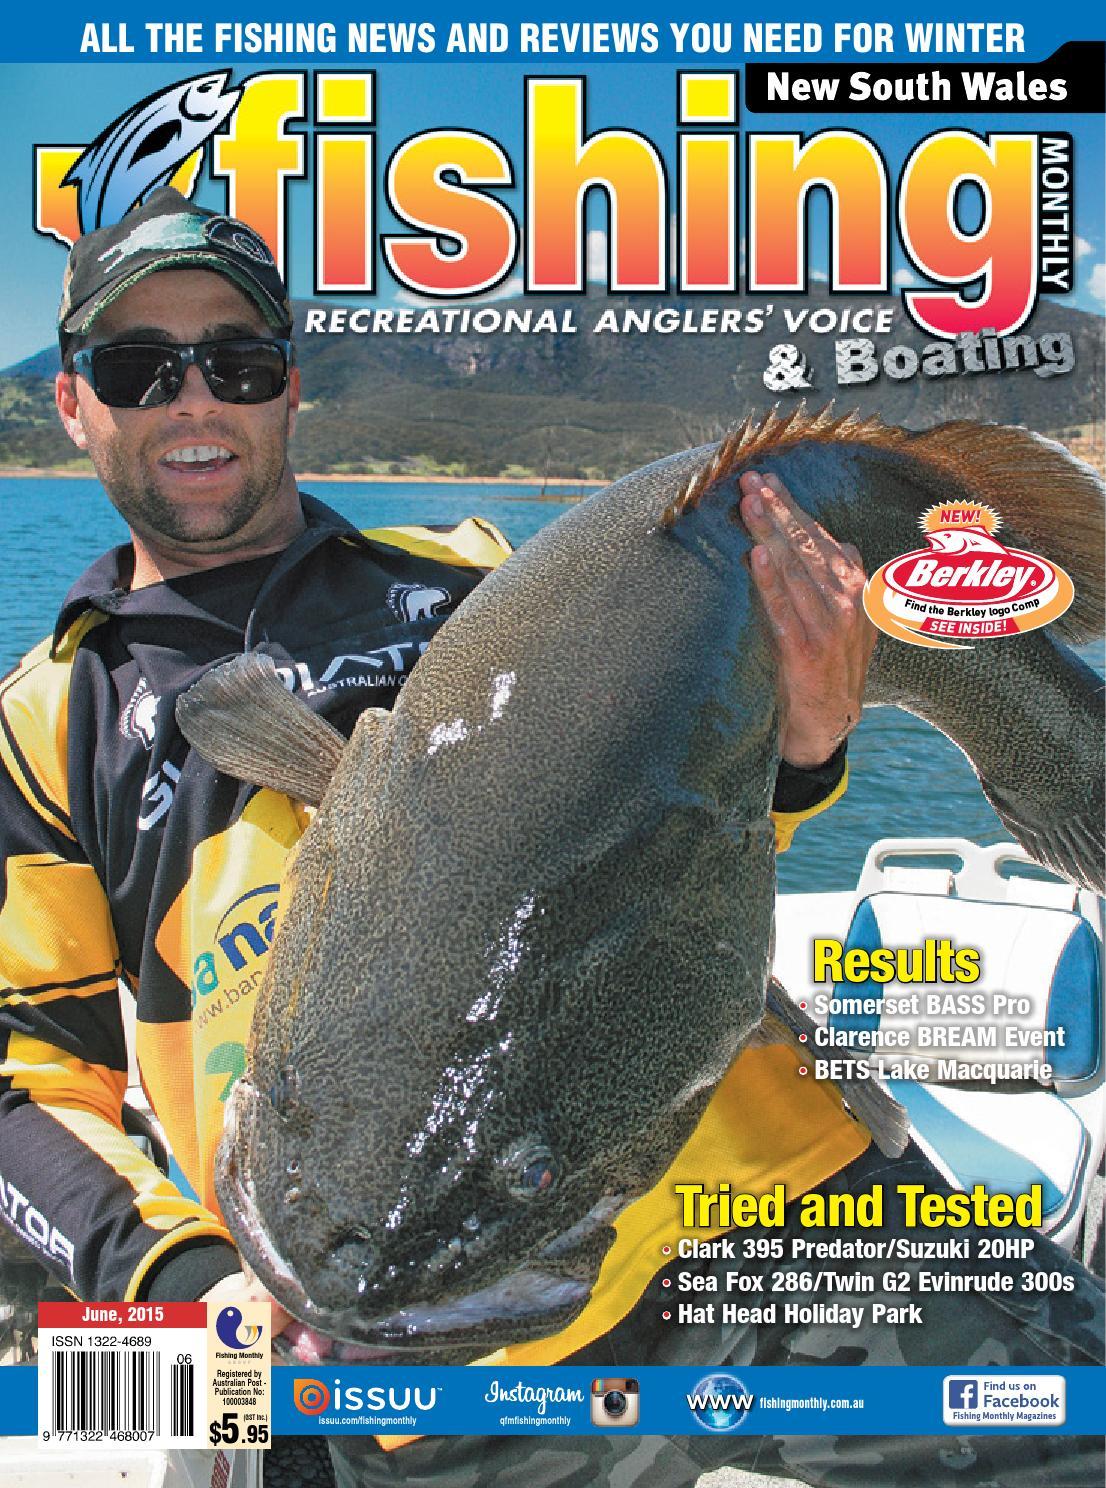 NEW Pro Catfish Fishing Compact Session Unhooking Mat 3m x 2.9m Camouflage Light